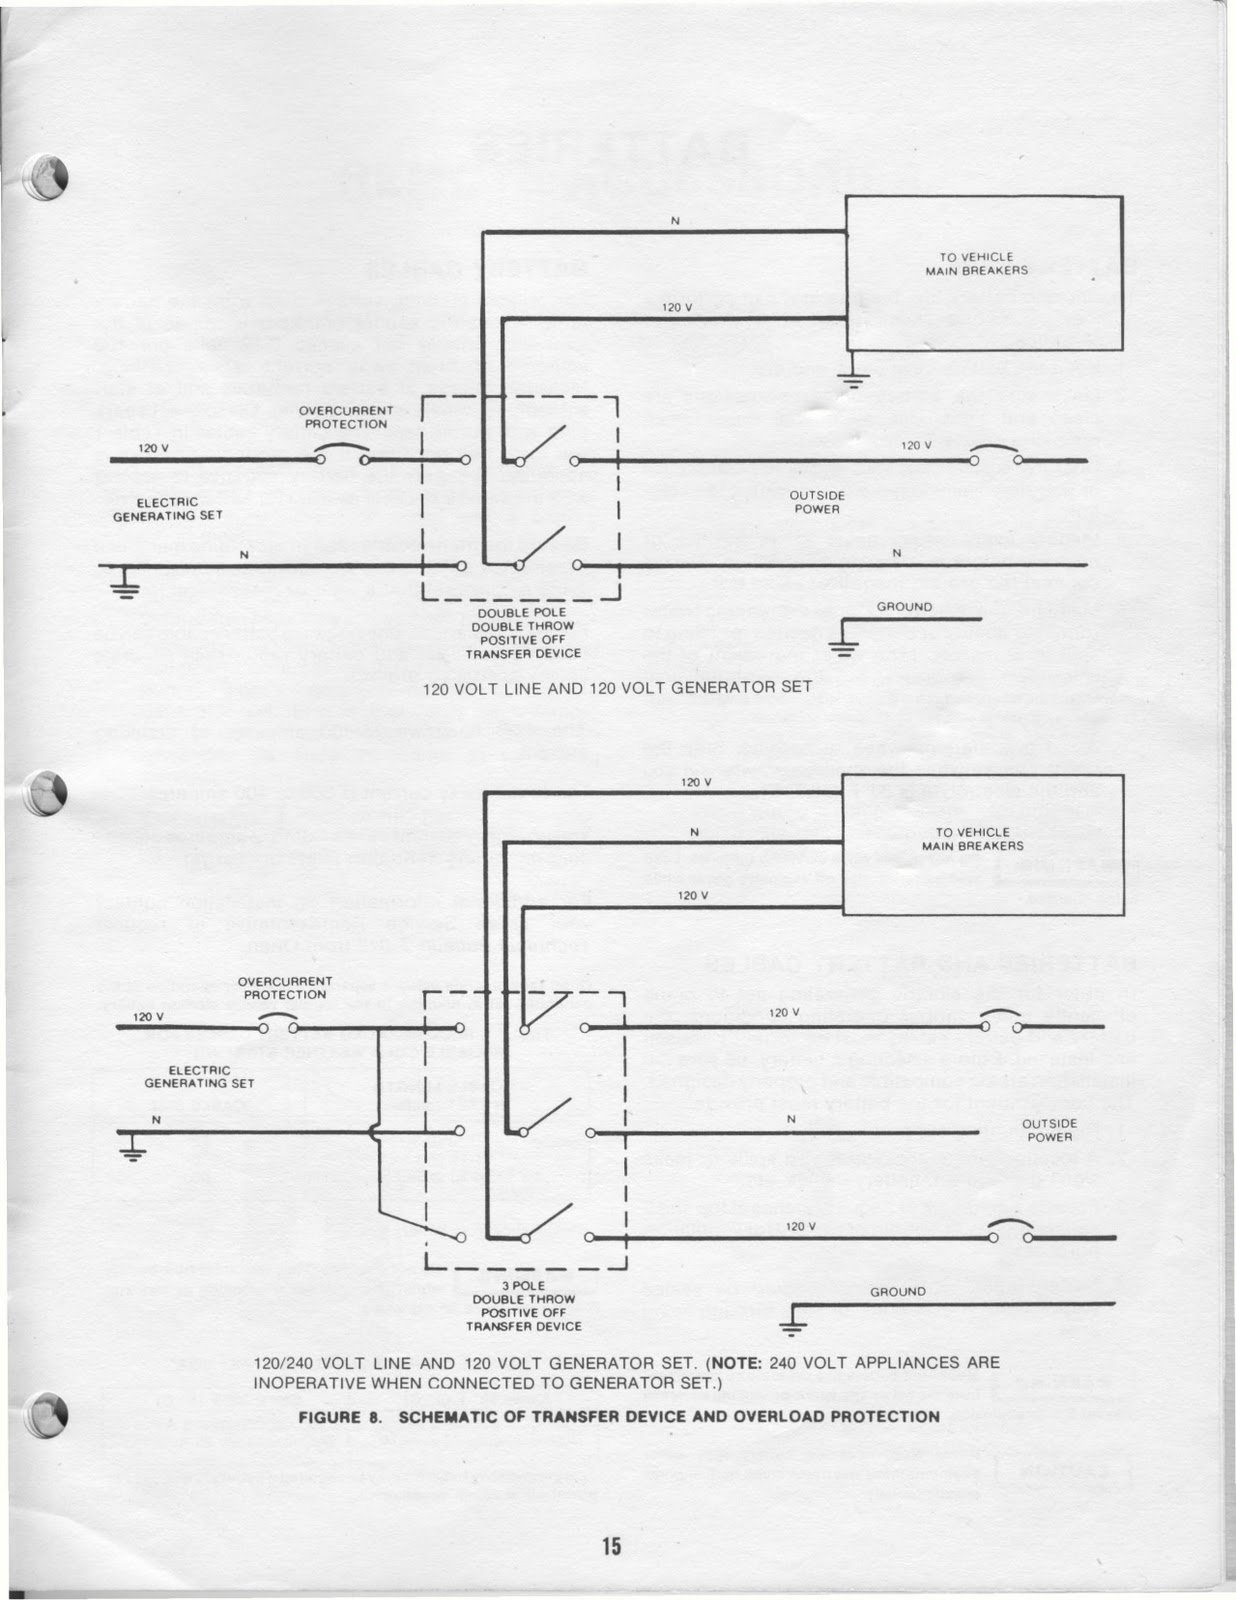 medium resolution of onan nh manual onan manual genuine onan n ignition coil kit includes coil bracket misc hardware etc replaces onan coil n bge nhe nhd bgm onan models